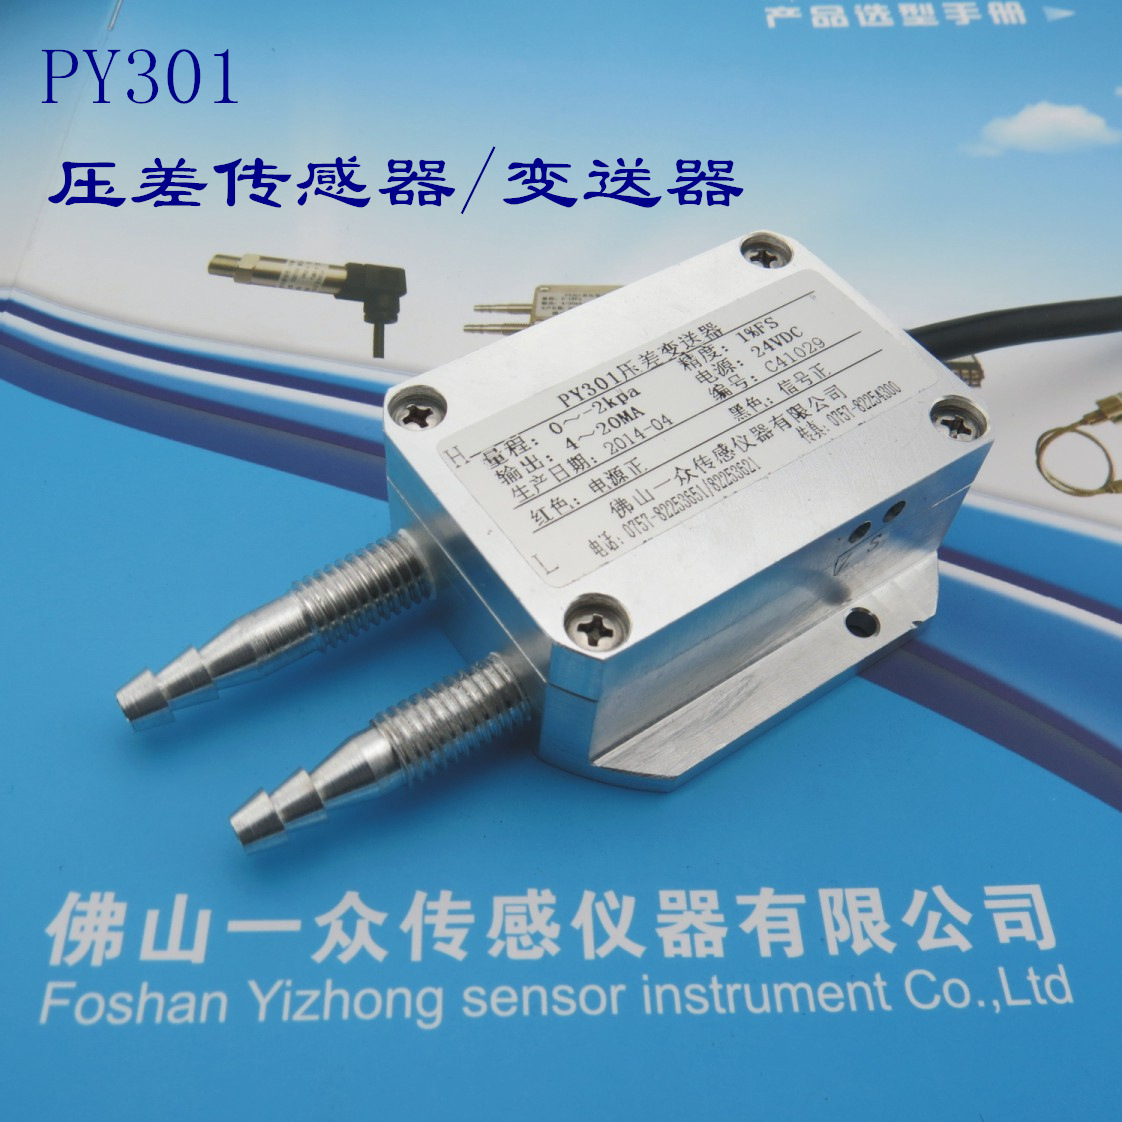 PY301-1